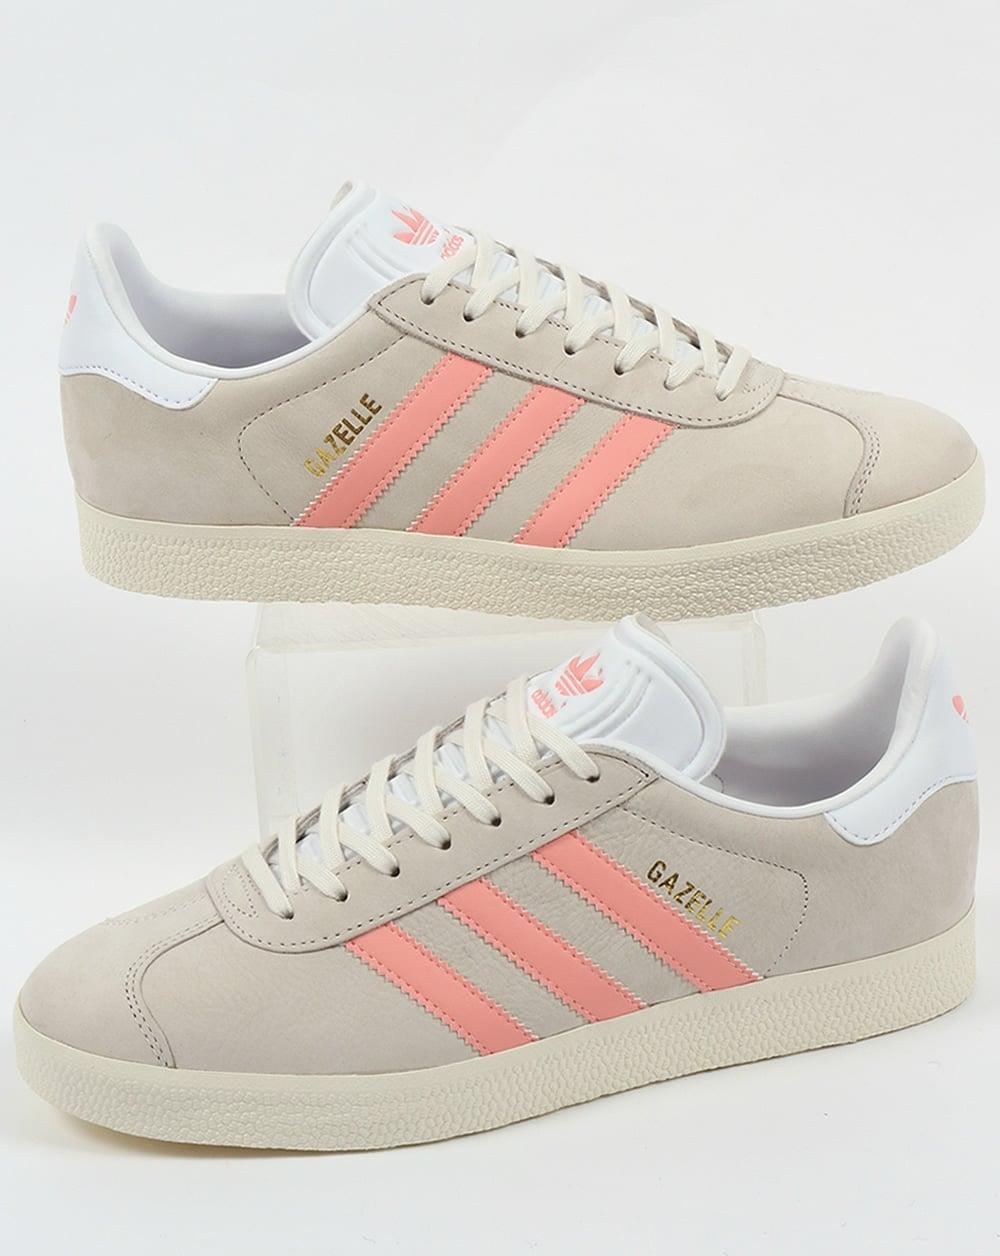 adidas gazelle trainers chalk white light pink originals. Black Bedroom Furniture Sets. Home Design Ideas